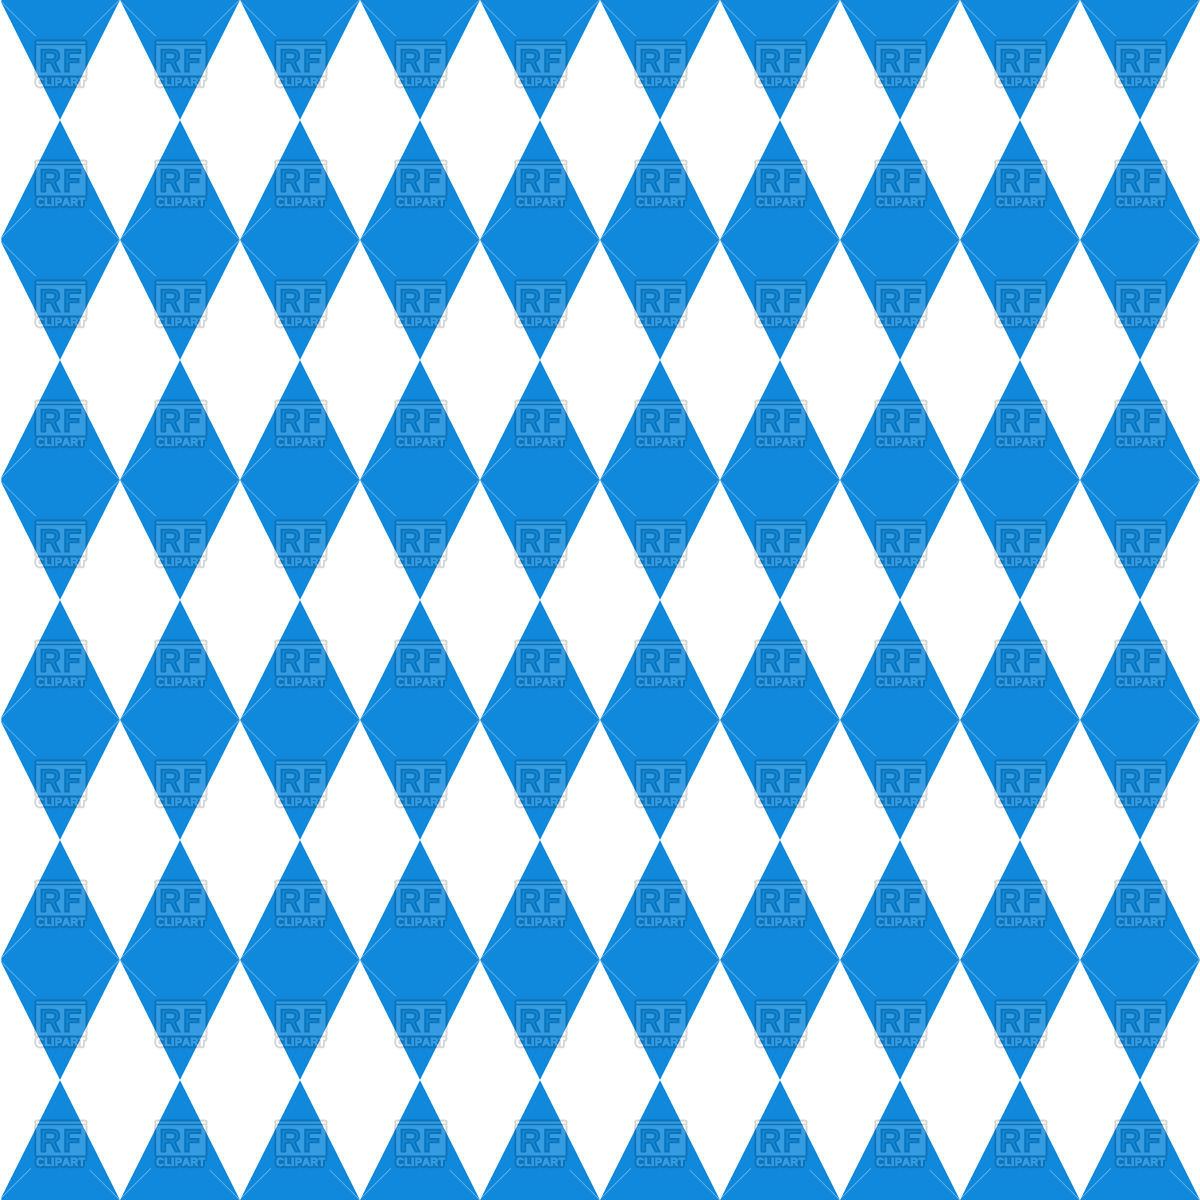 Seamless Bavarian flag pattern Vector Image #42896.